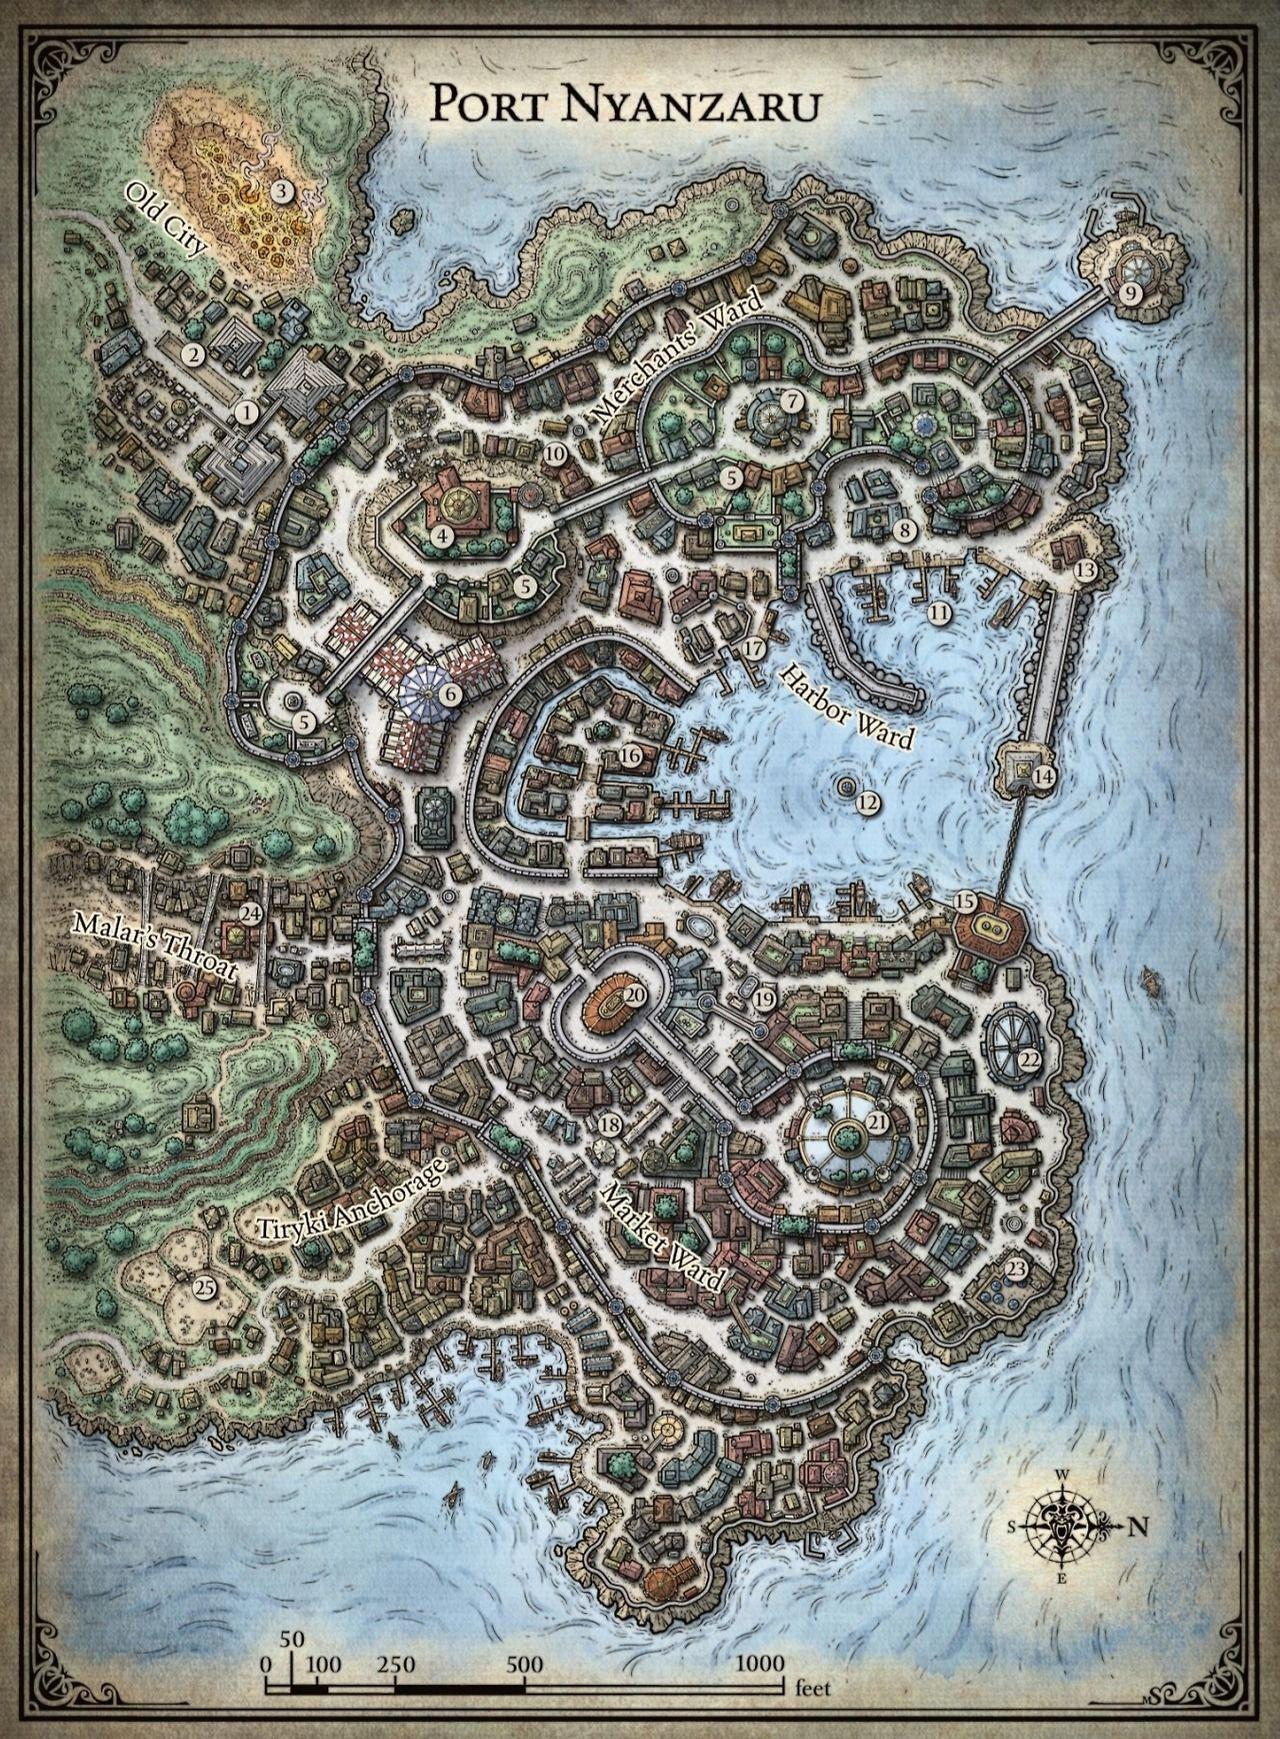 Rpgsandbox: Map Of Port Nyanzaru From The D&D... - Thegamemasterlovesyou